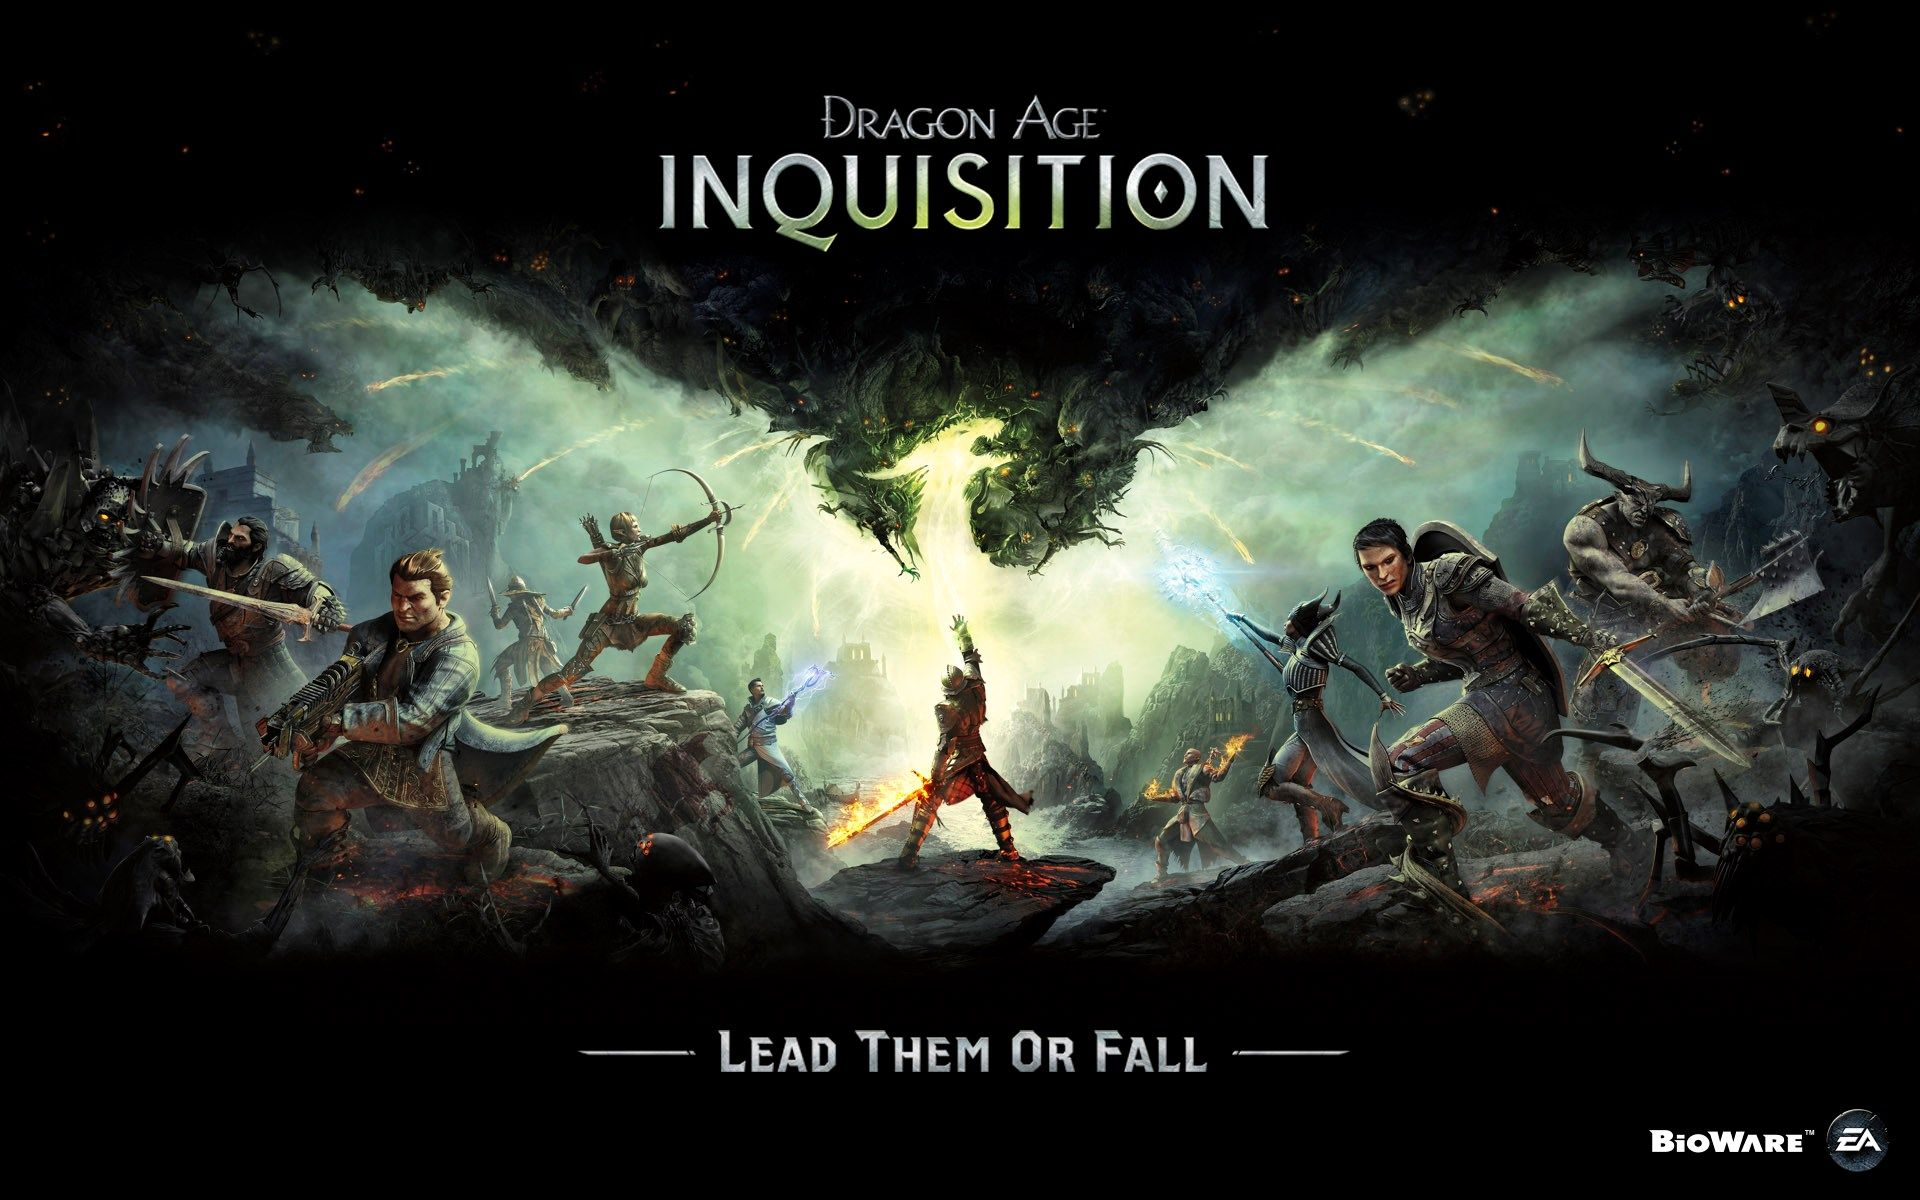 Dragon Age Inquisition Wallpaper Wordsworth Jones 2016 02 12 Dragon Age Inquisition Dragon Age Dragon Age 3